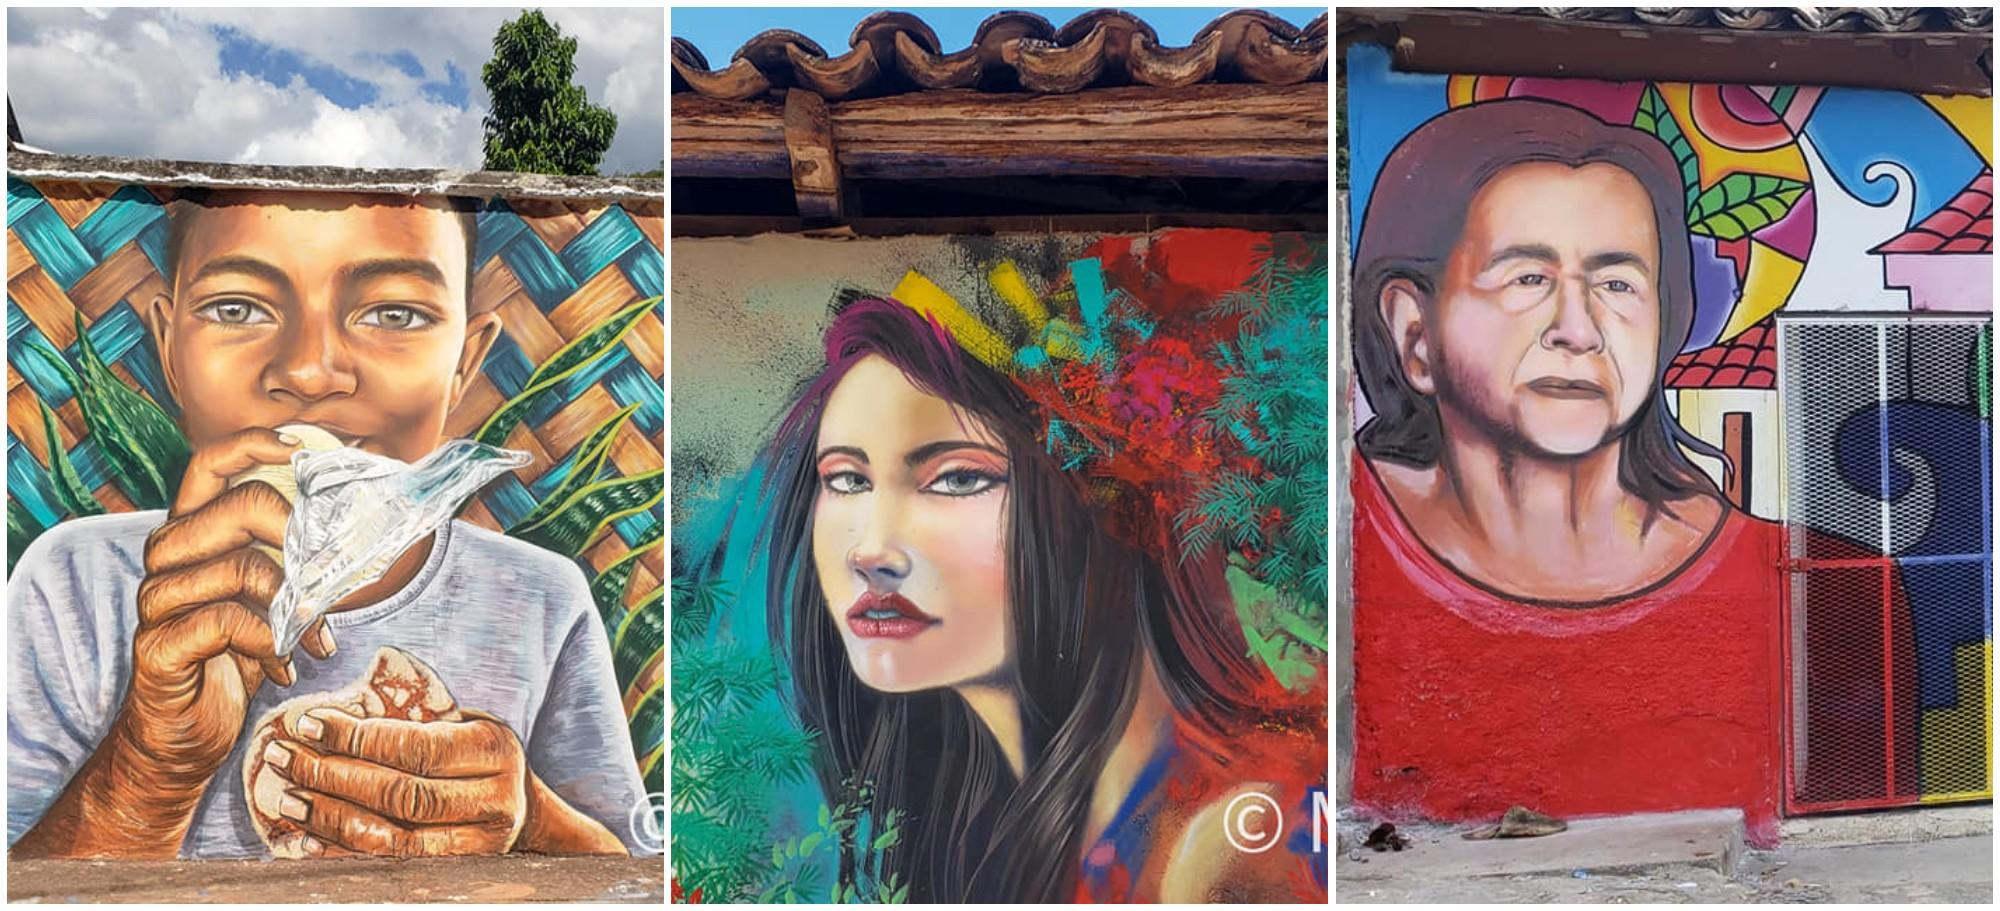 Arada, Santa Bárbara se llena de color en el Guancasco Muralista